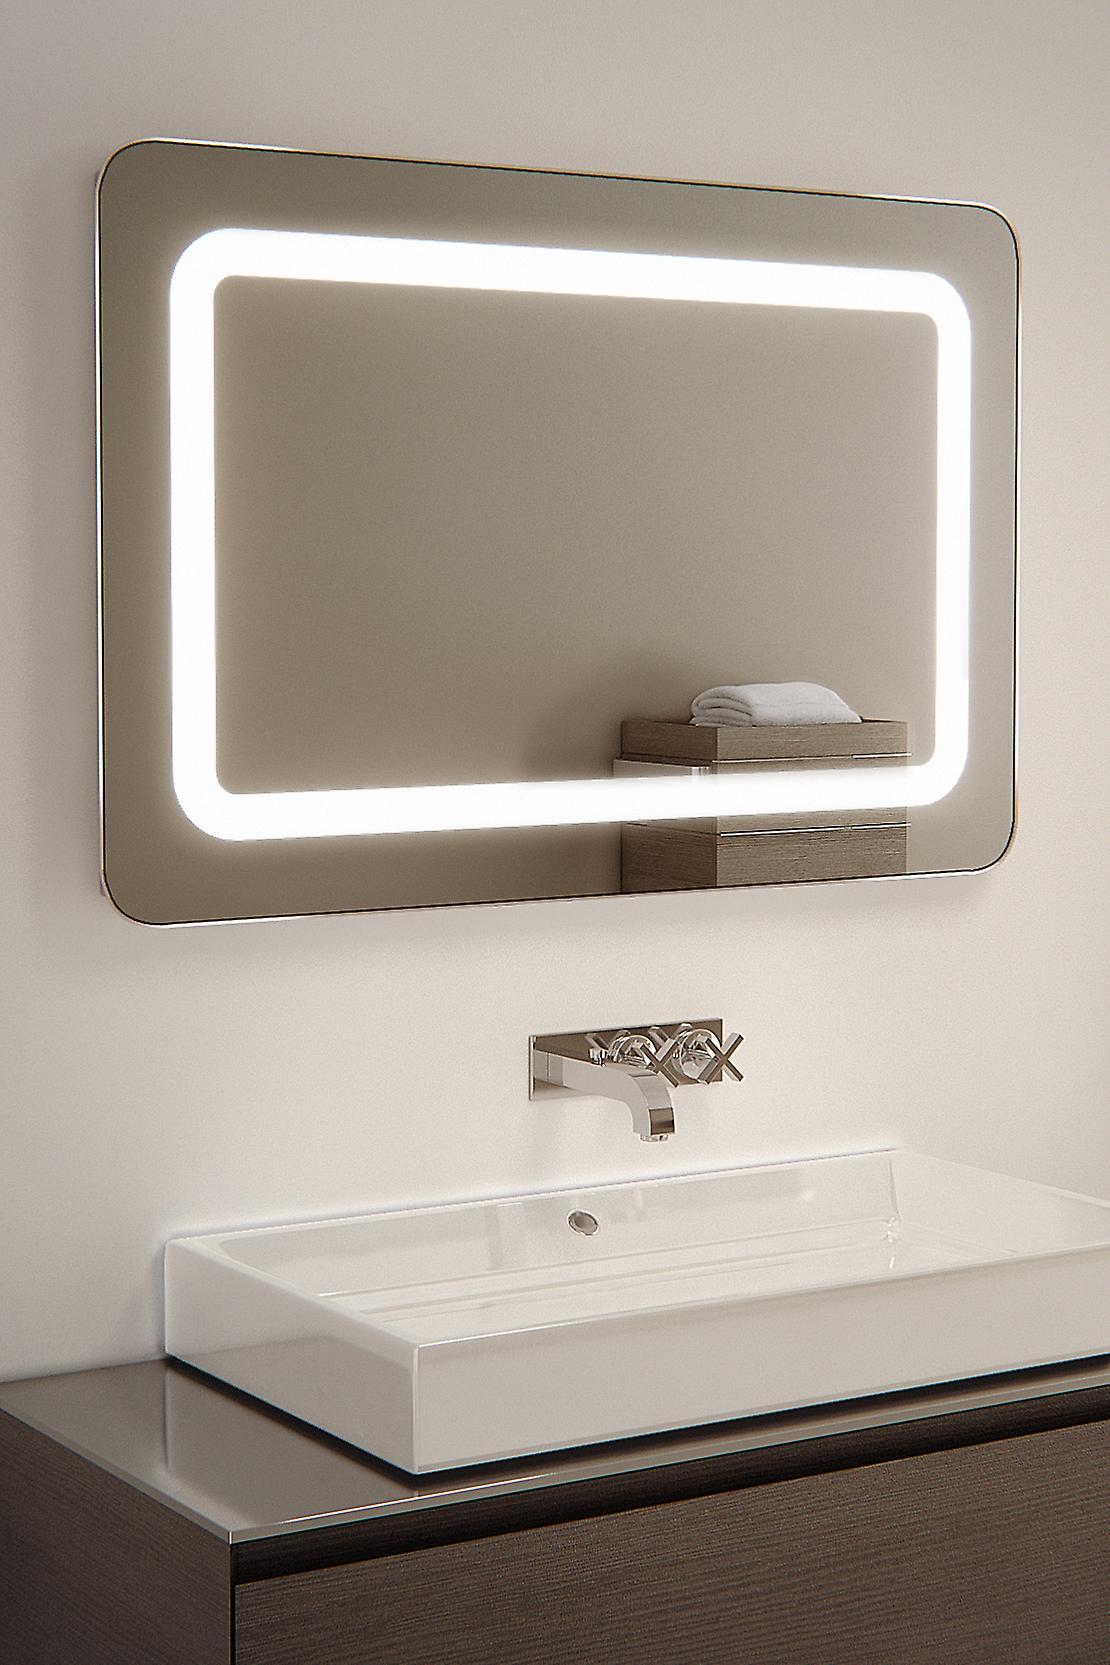 Raja Shaver LED Bathroom Mirror With Demister Pad & Sensor k45i